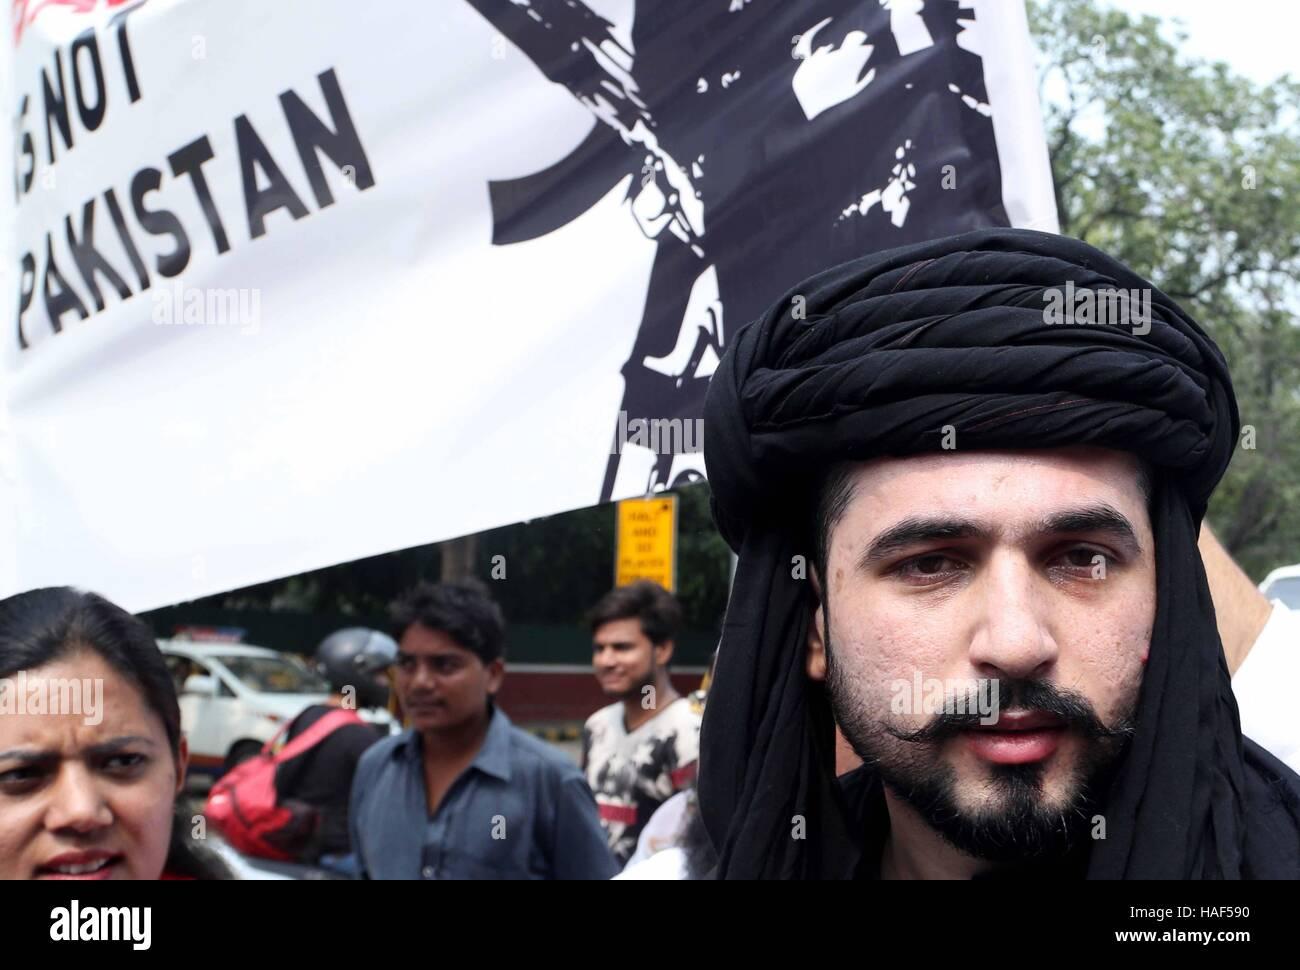 baloch leader seeks india - HD1300×970